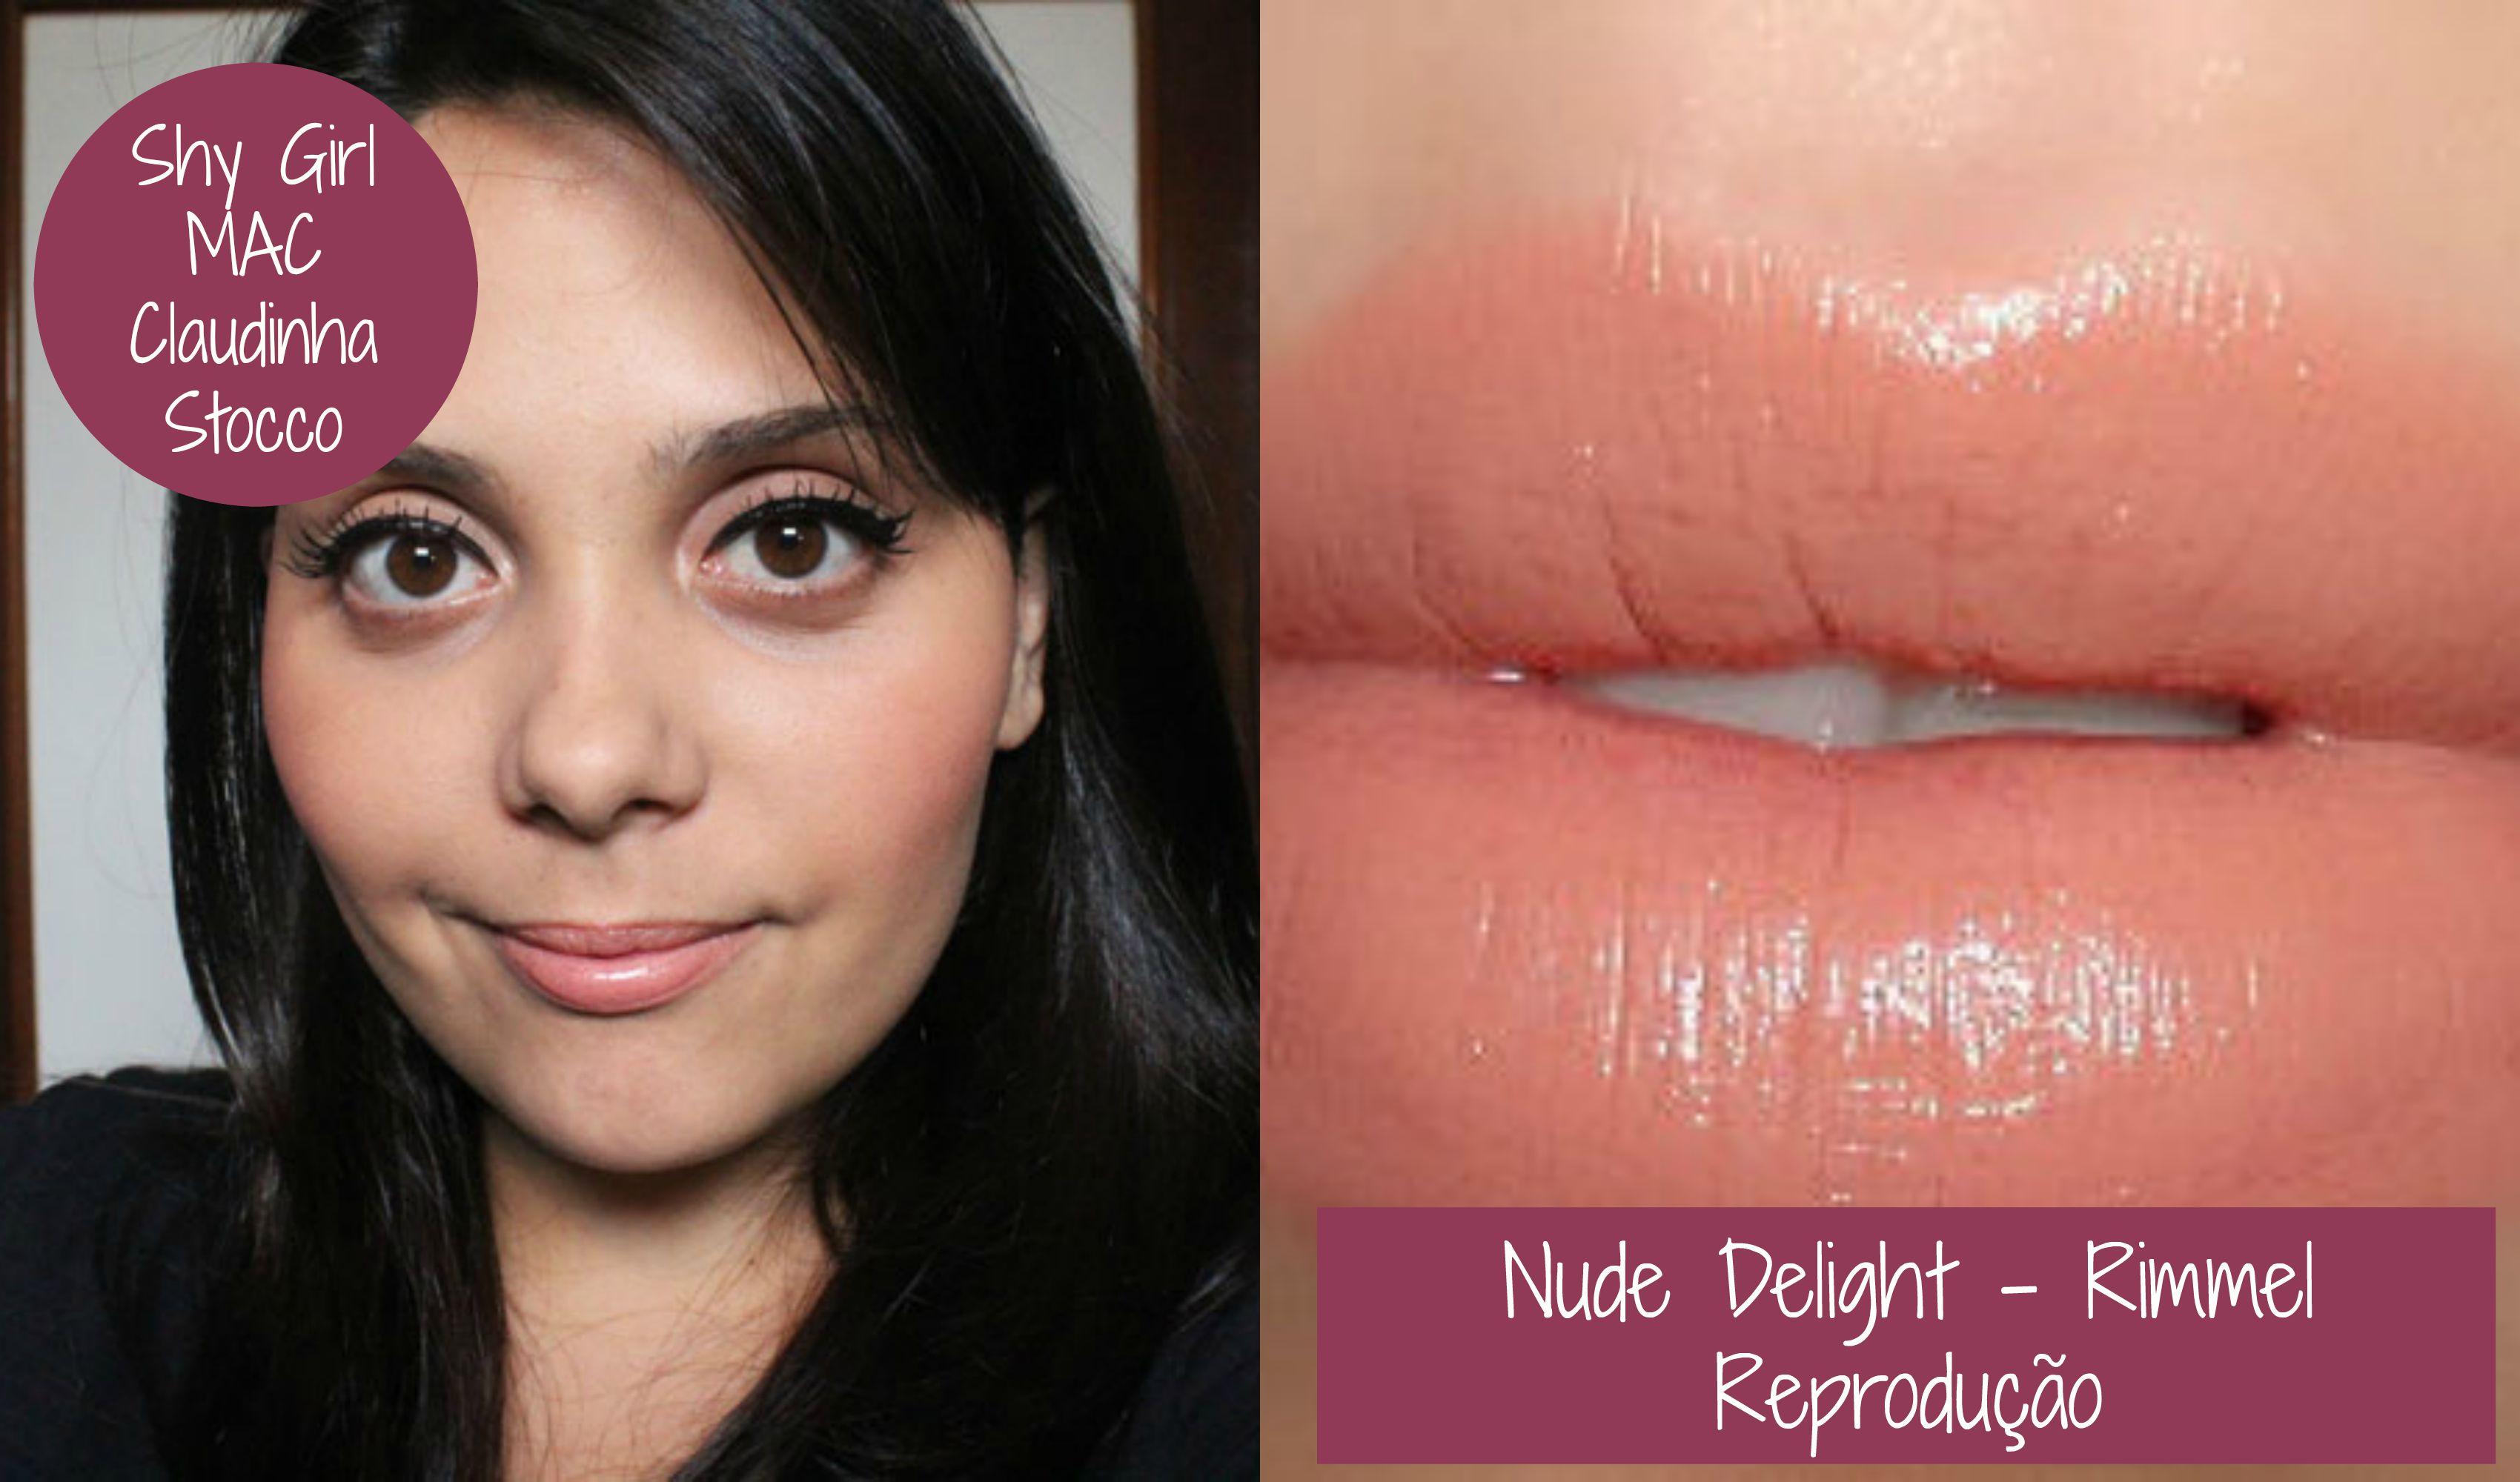 Mac Shy Girl Lipstick | www.pixshark.com - Images ...